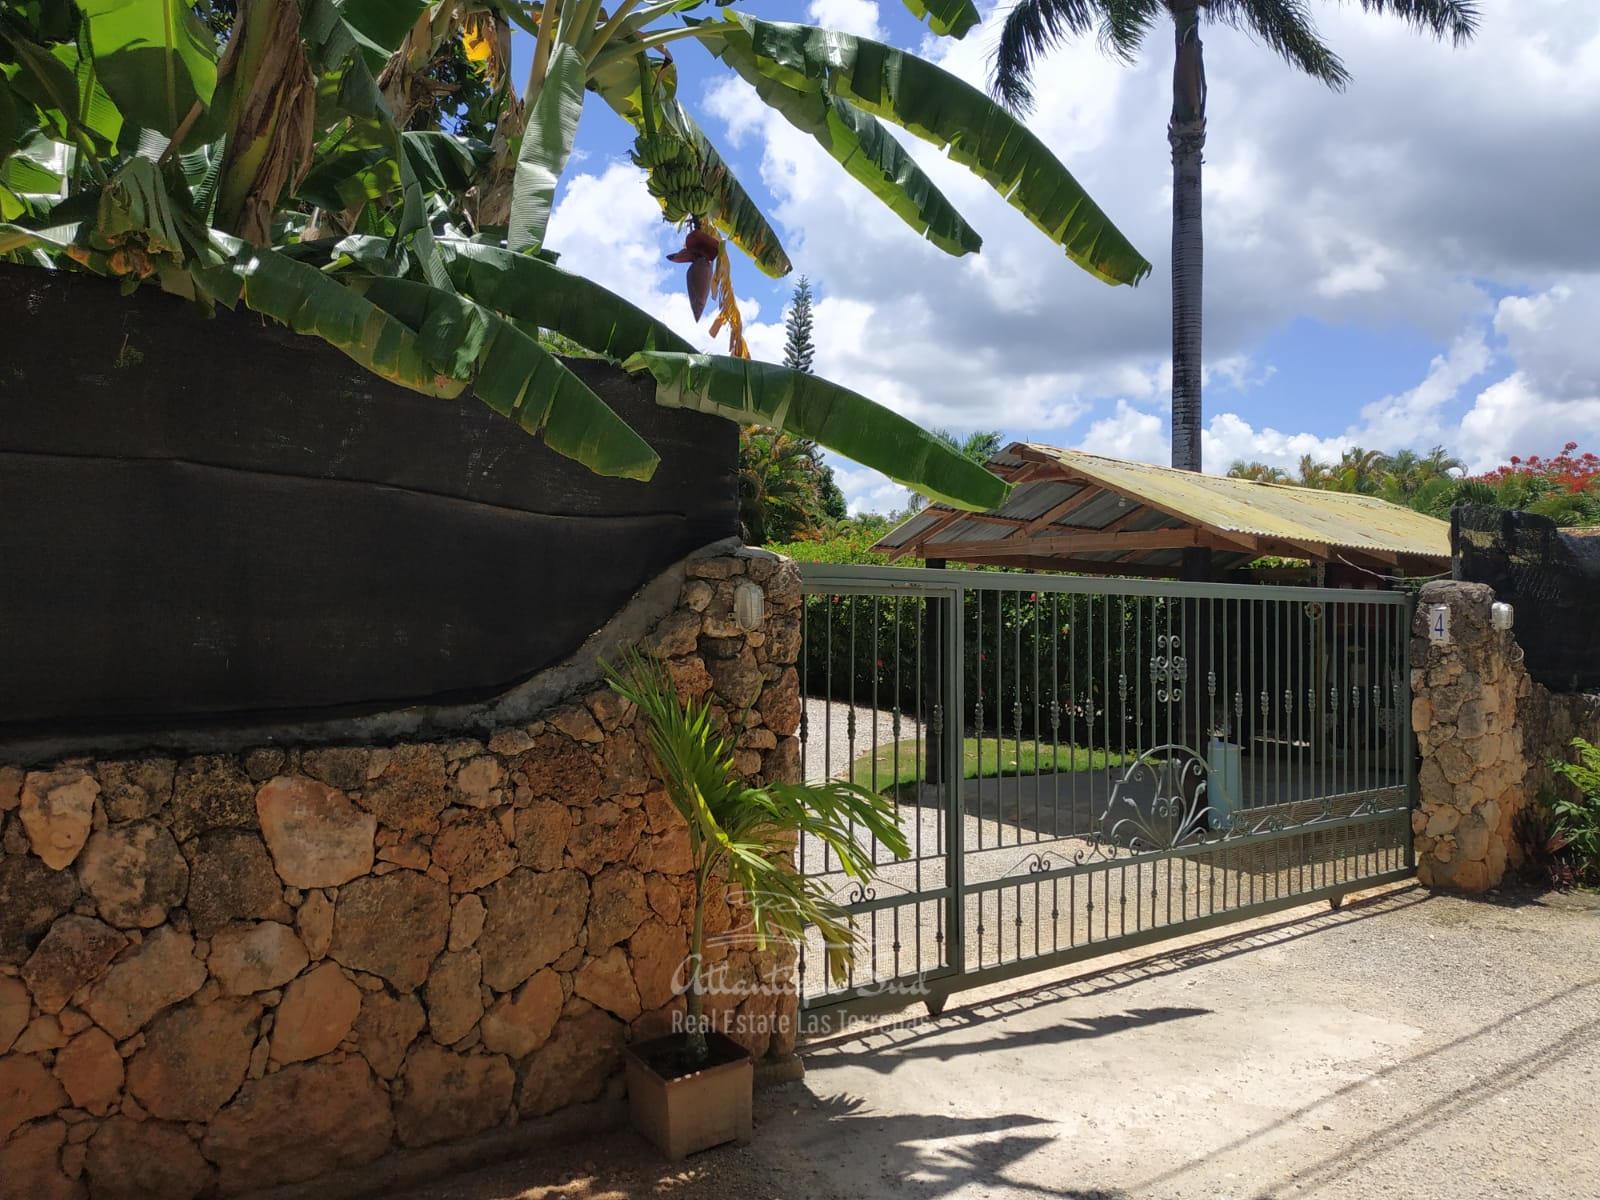 Villa Authentic Carribean Real Estate Las Terrenas Dominican Republic2.jpg